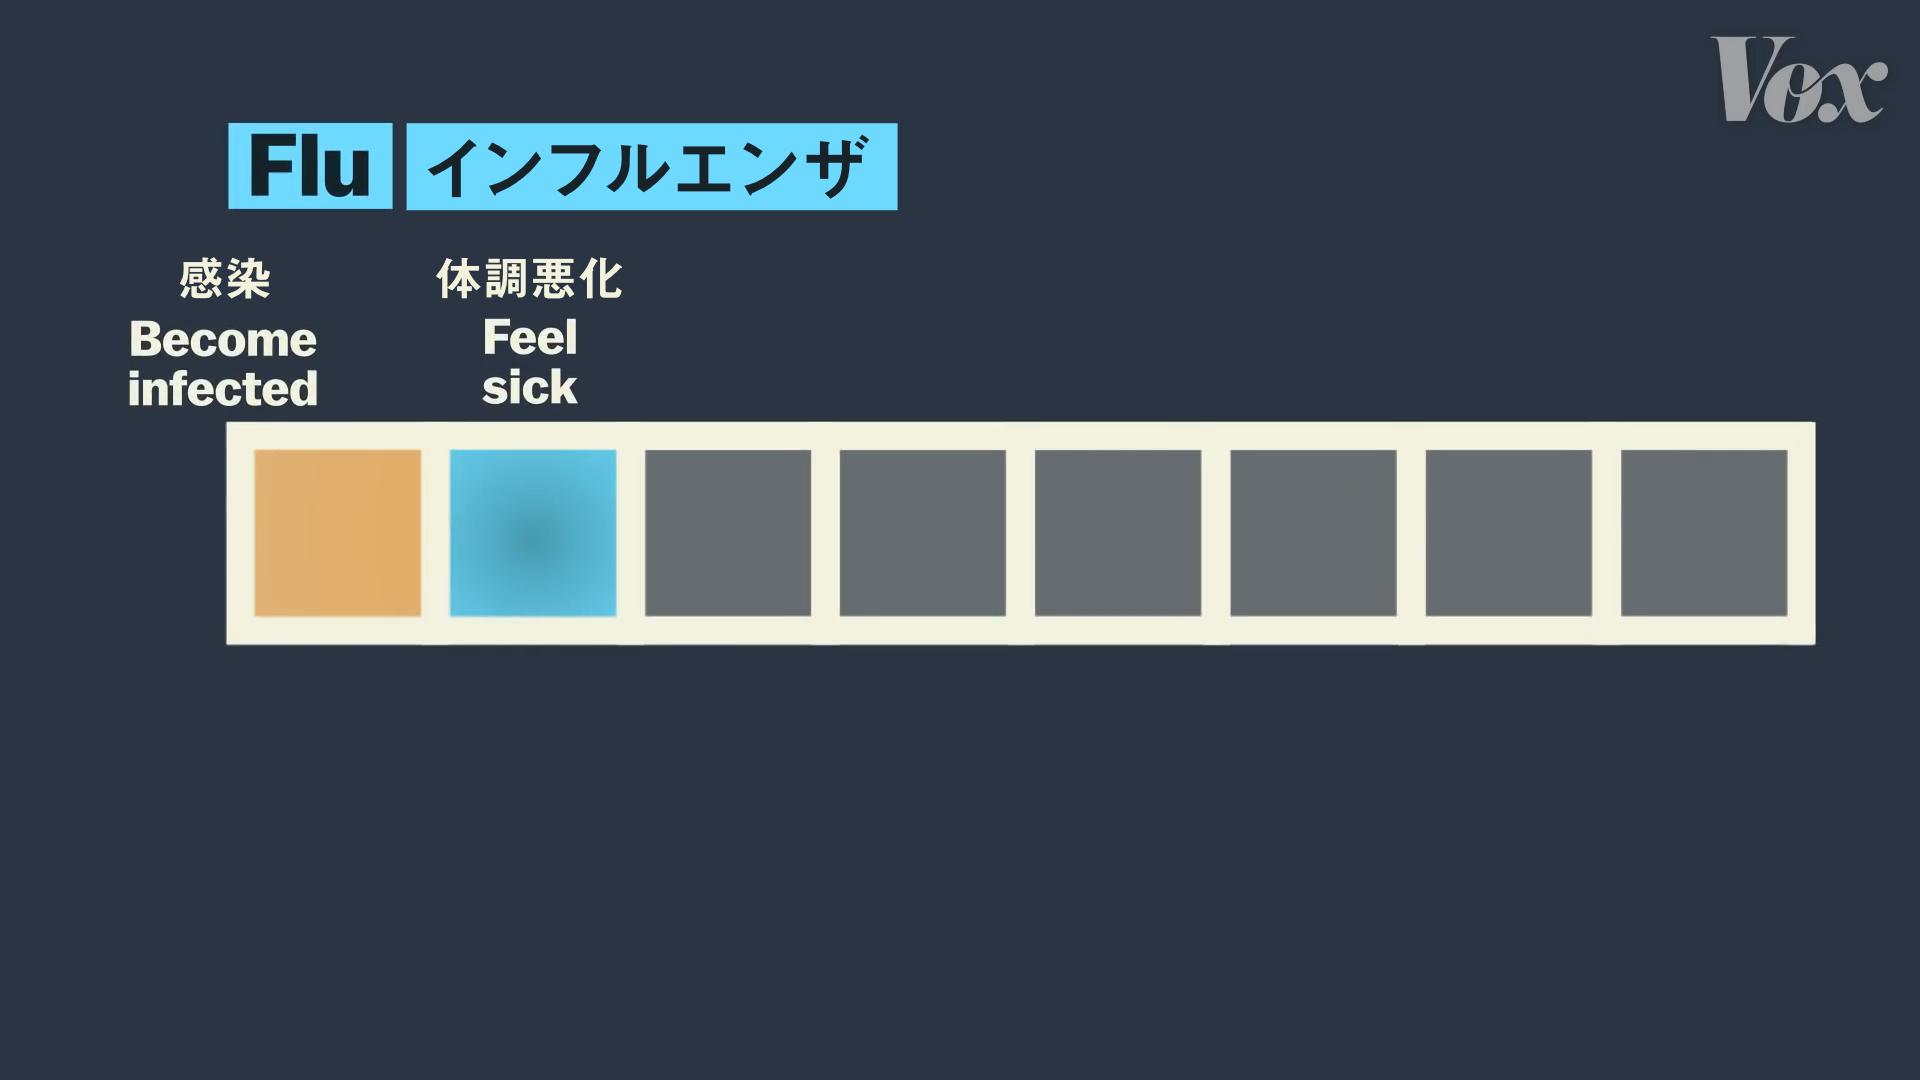 f:id:Imamura:20200408133320p:plain